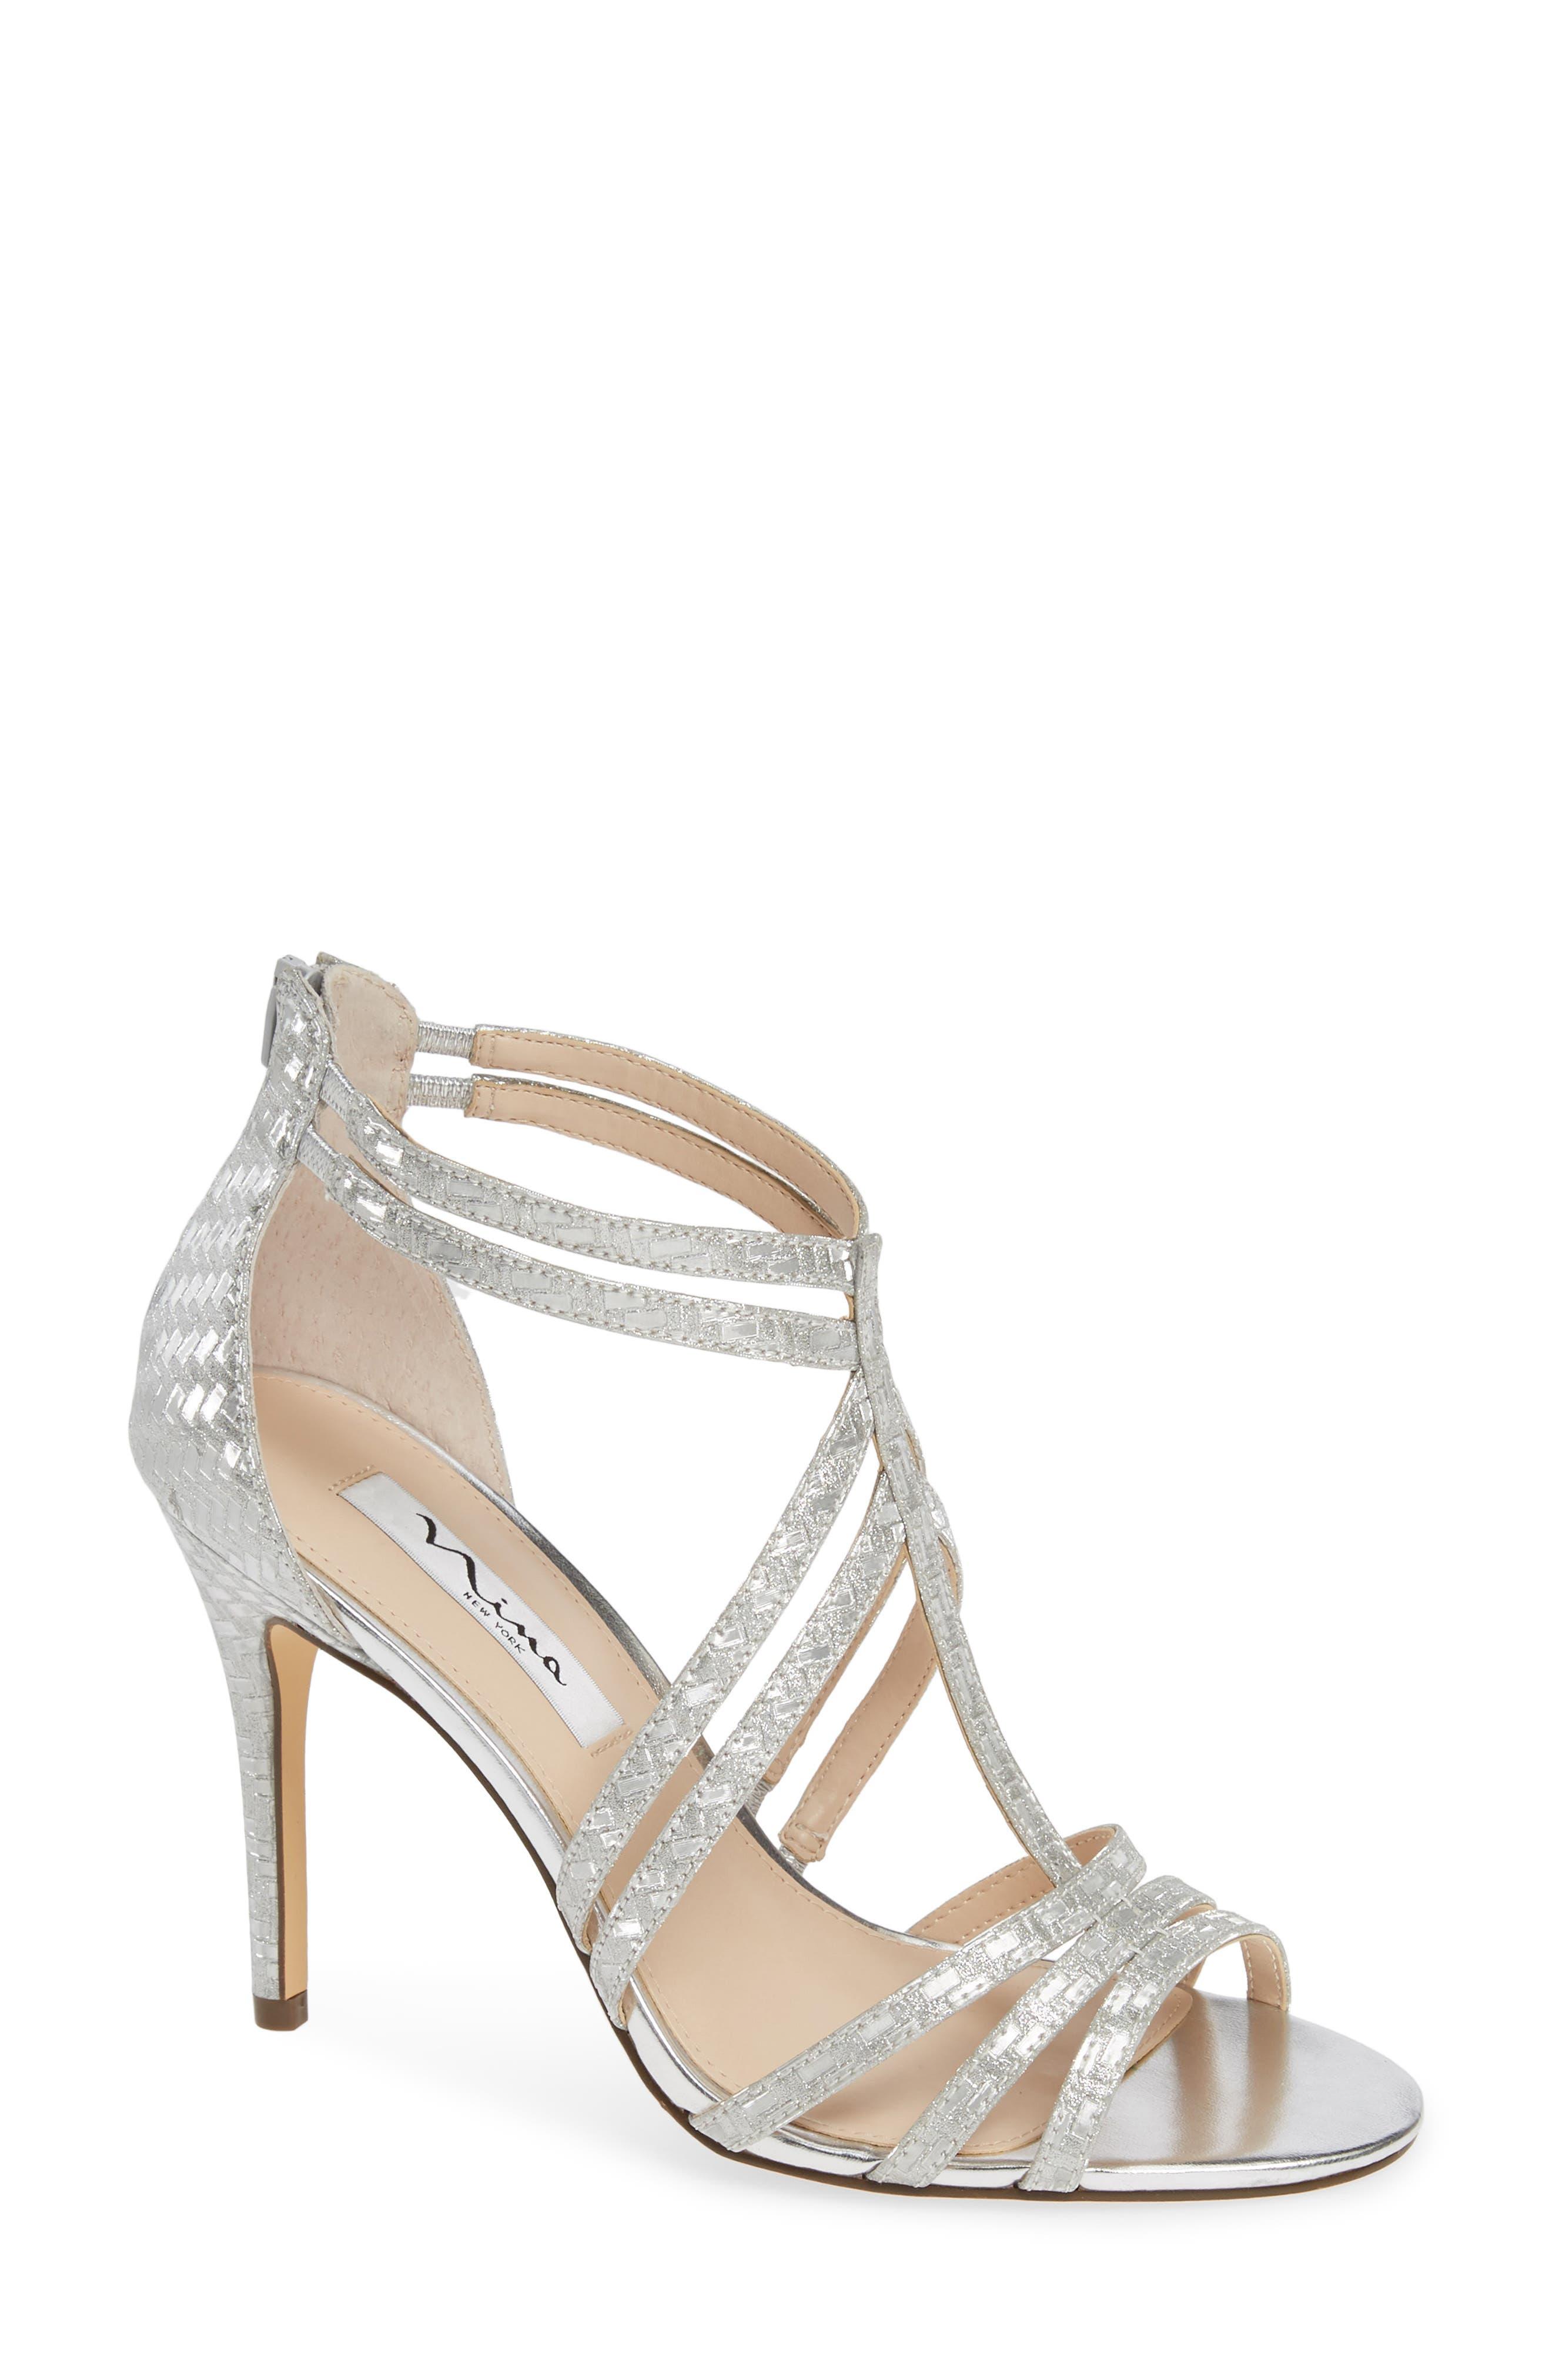 57f680d3530 Nina Carlie Ankle Strap Sandal- Metallic